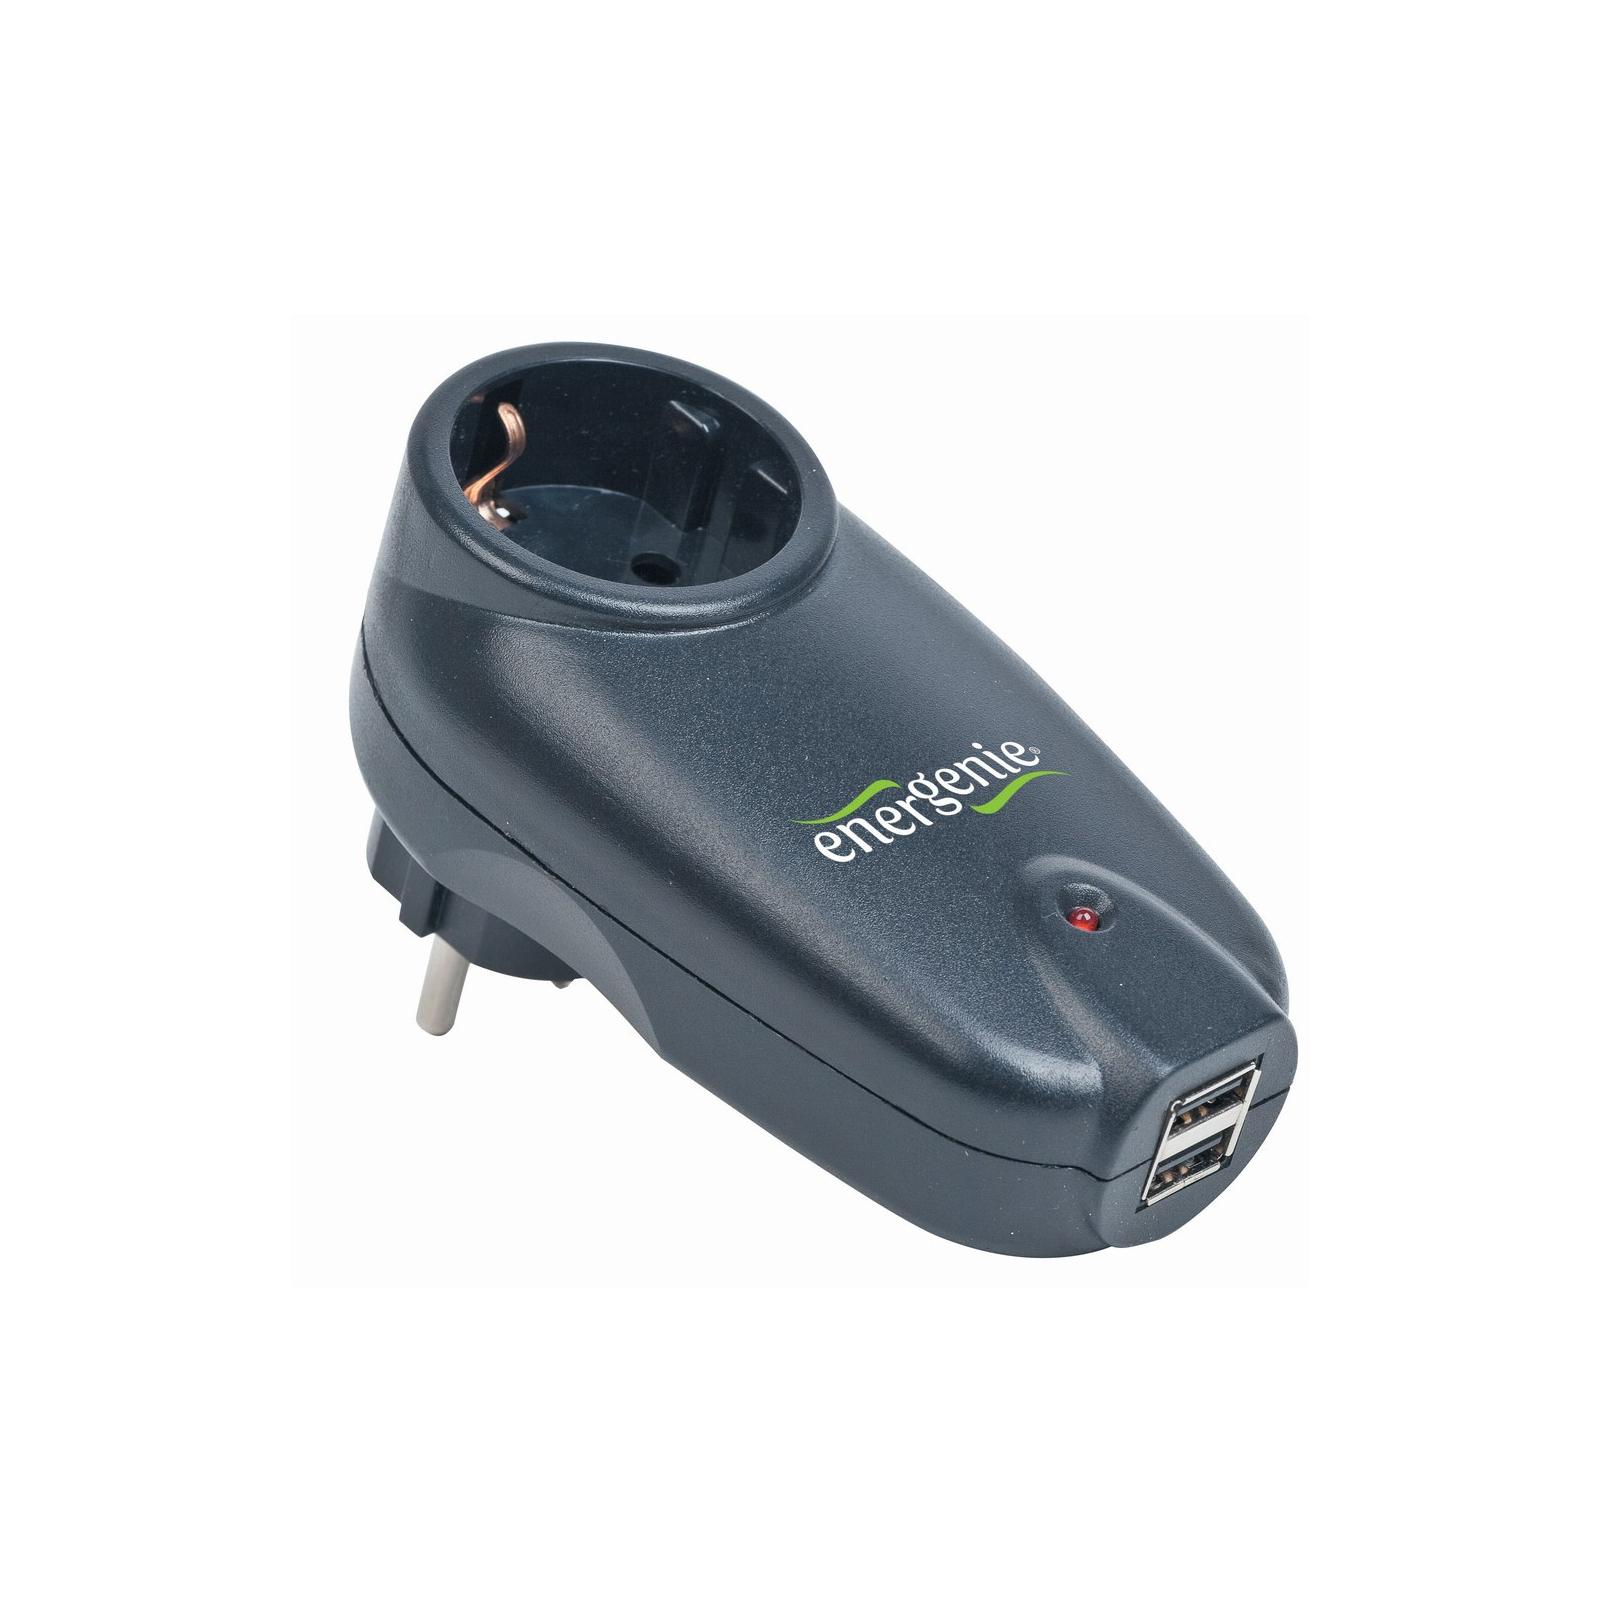 Сетевой фильтр питания EnerGenie Single AC socket Surge protected USB charger, black (SPG1-U)